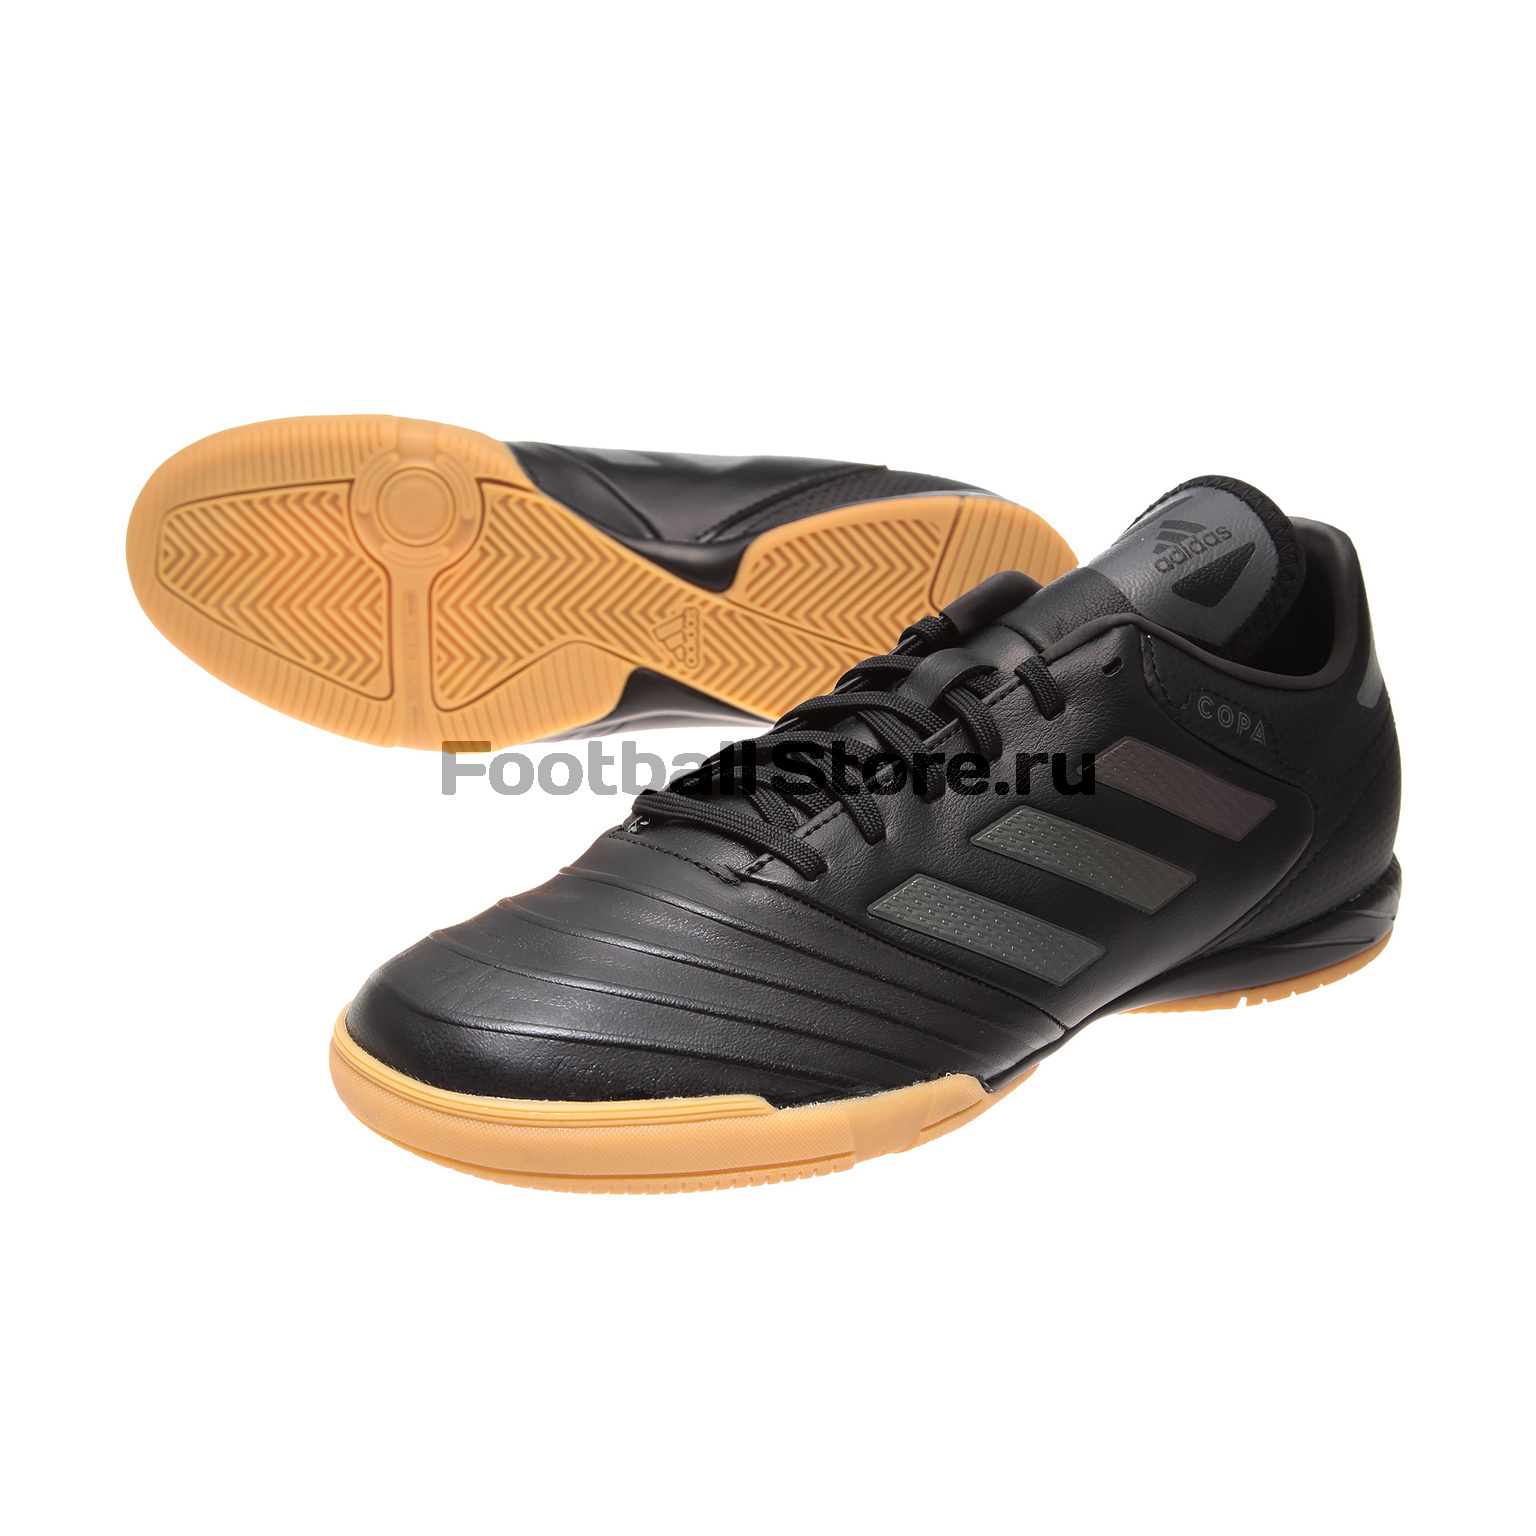 Обувь для зала Adidas Copa Tango 18.3 IN CP9018 цена